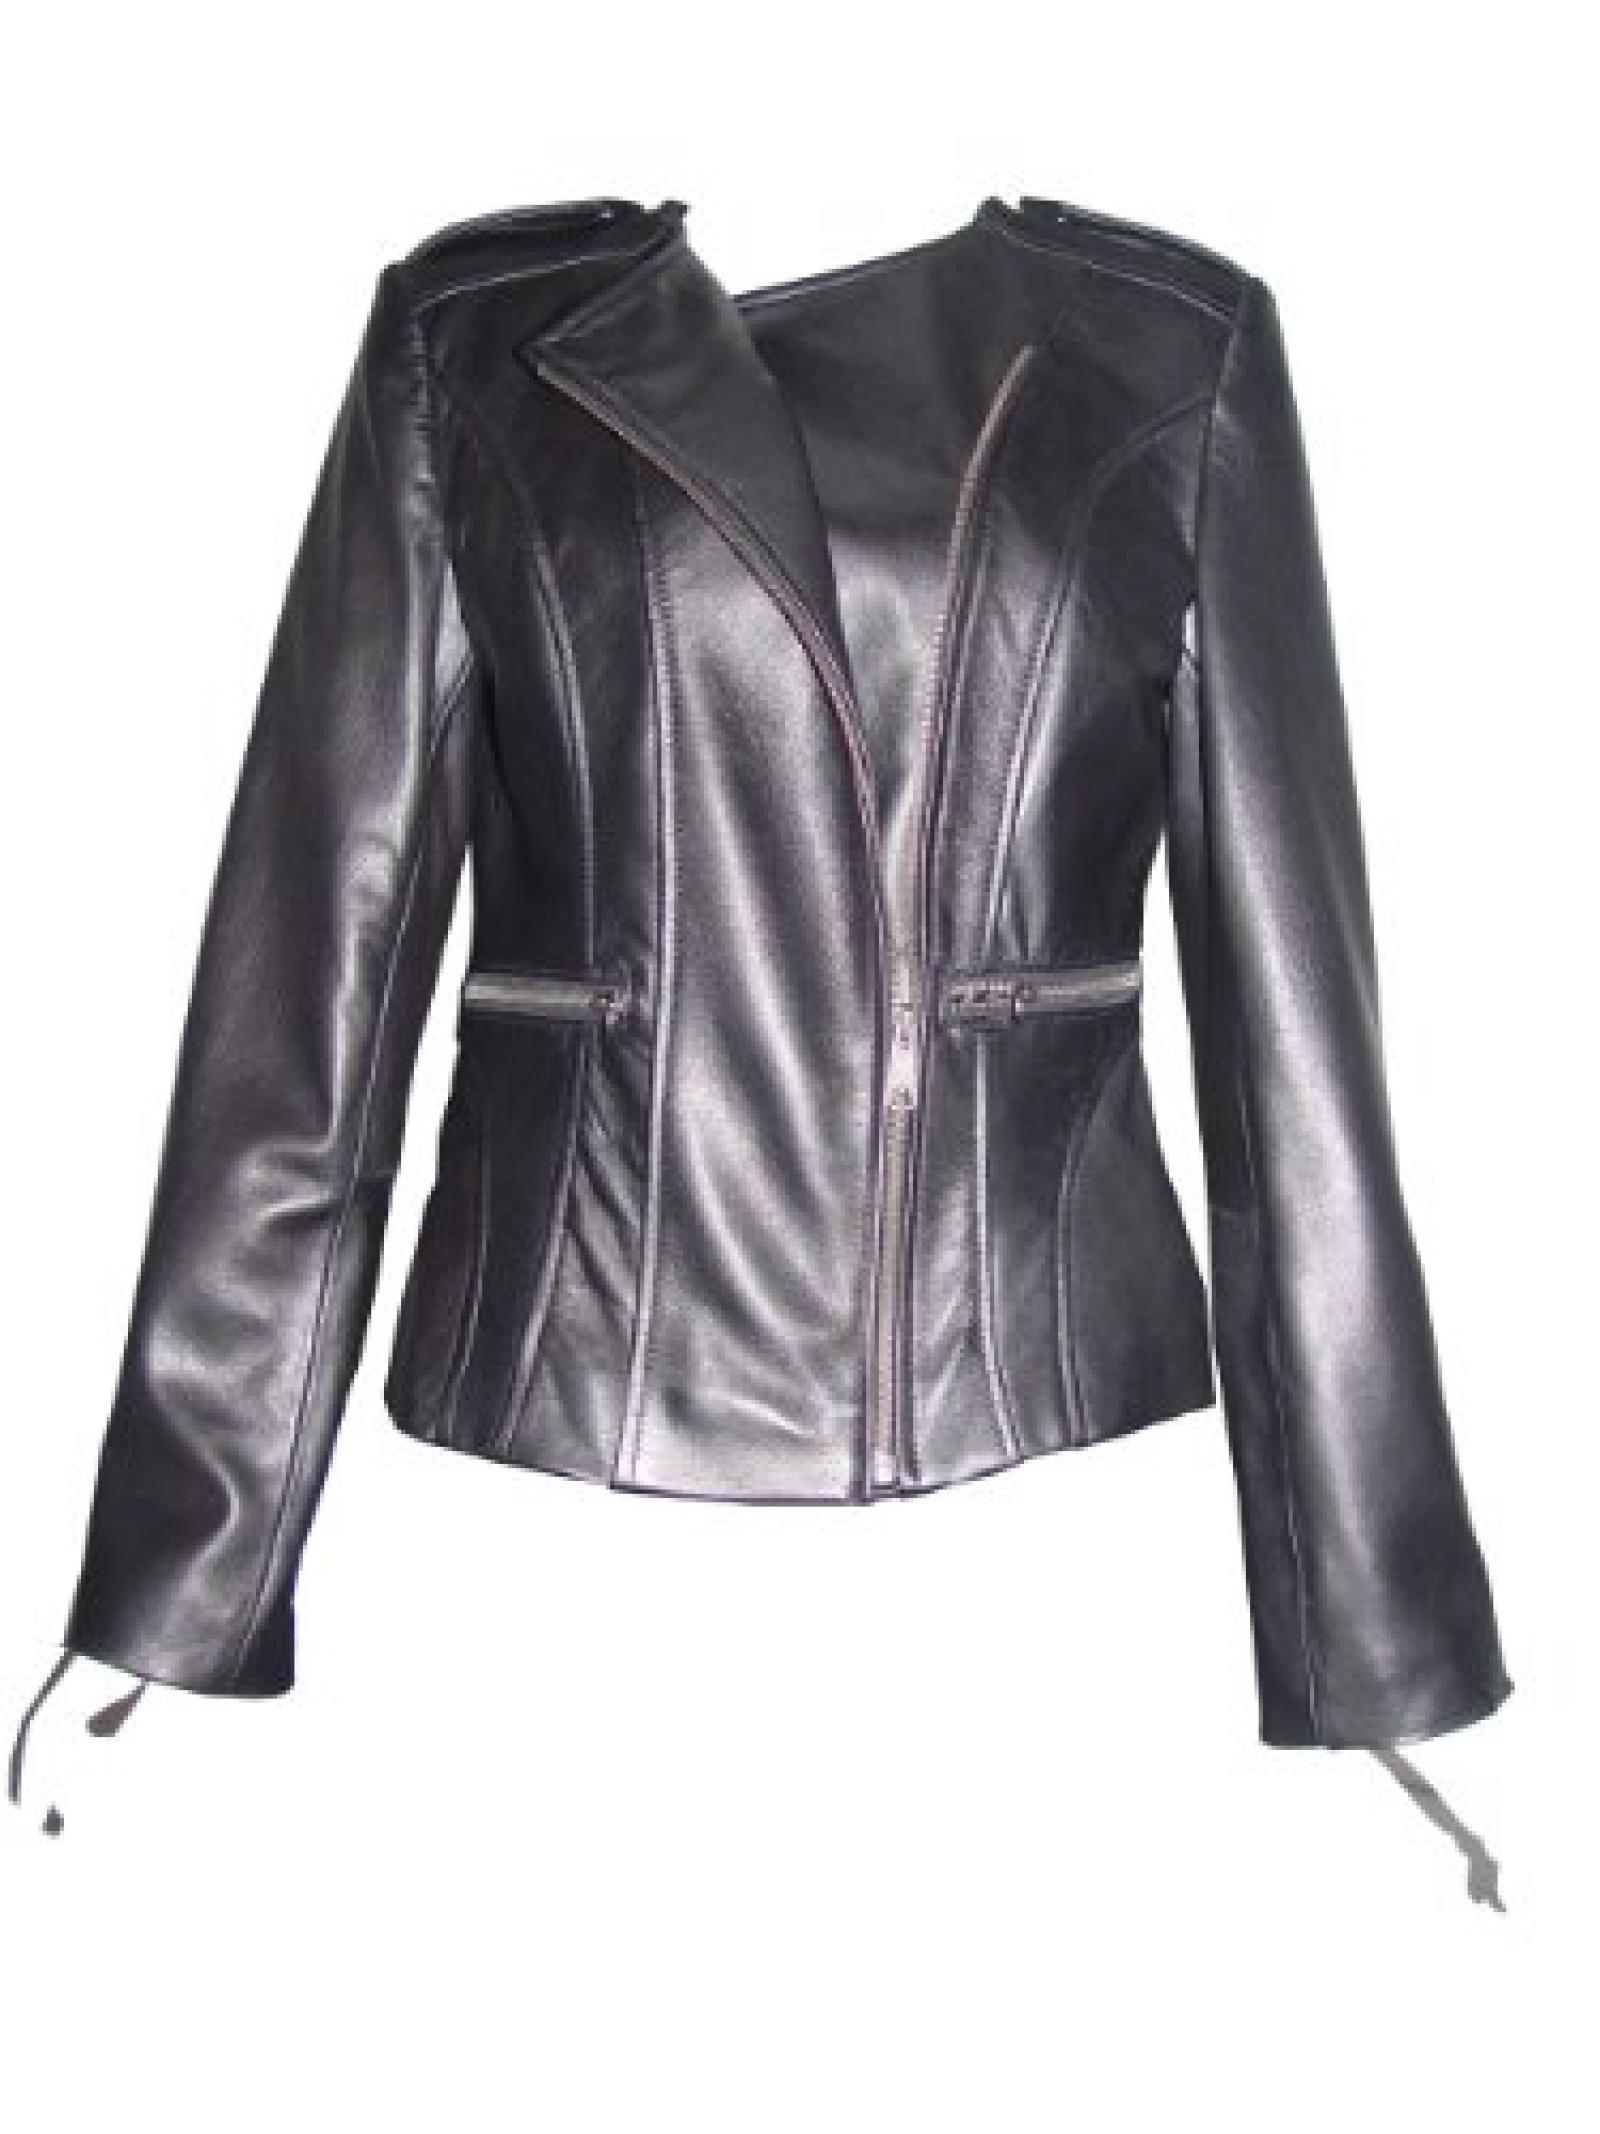 Nettailor FREE tailoring Women PLUS SIZE 4069 Leather Moto Jacket Collarless